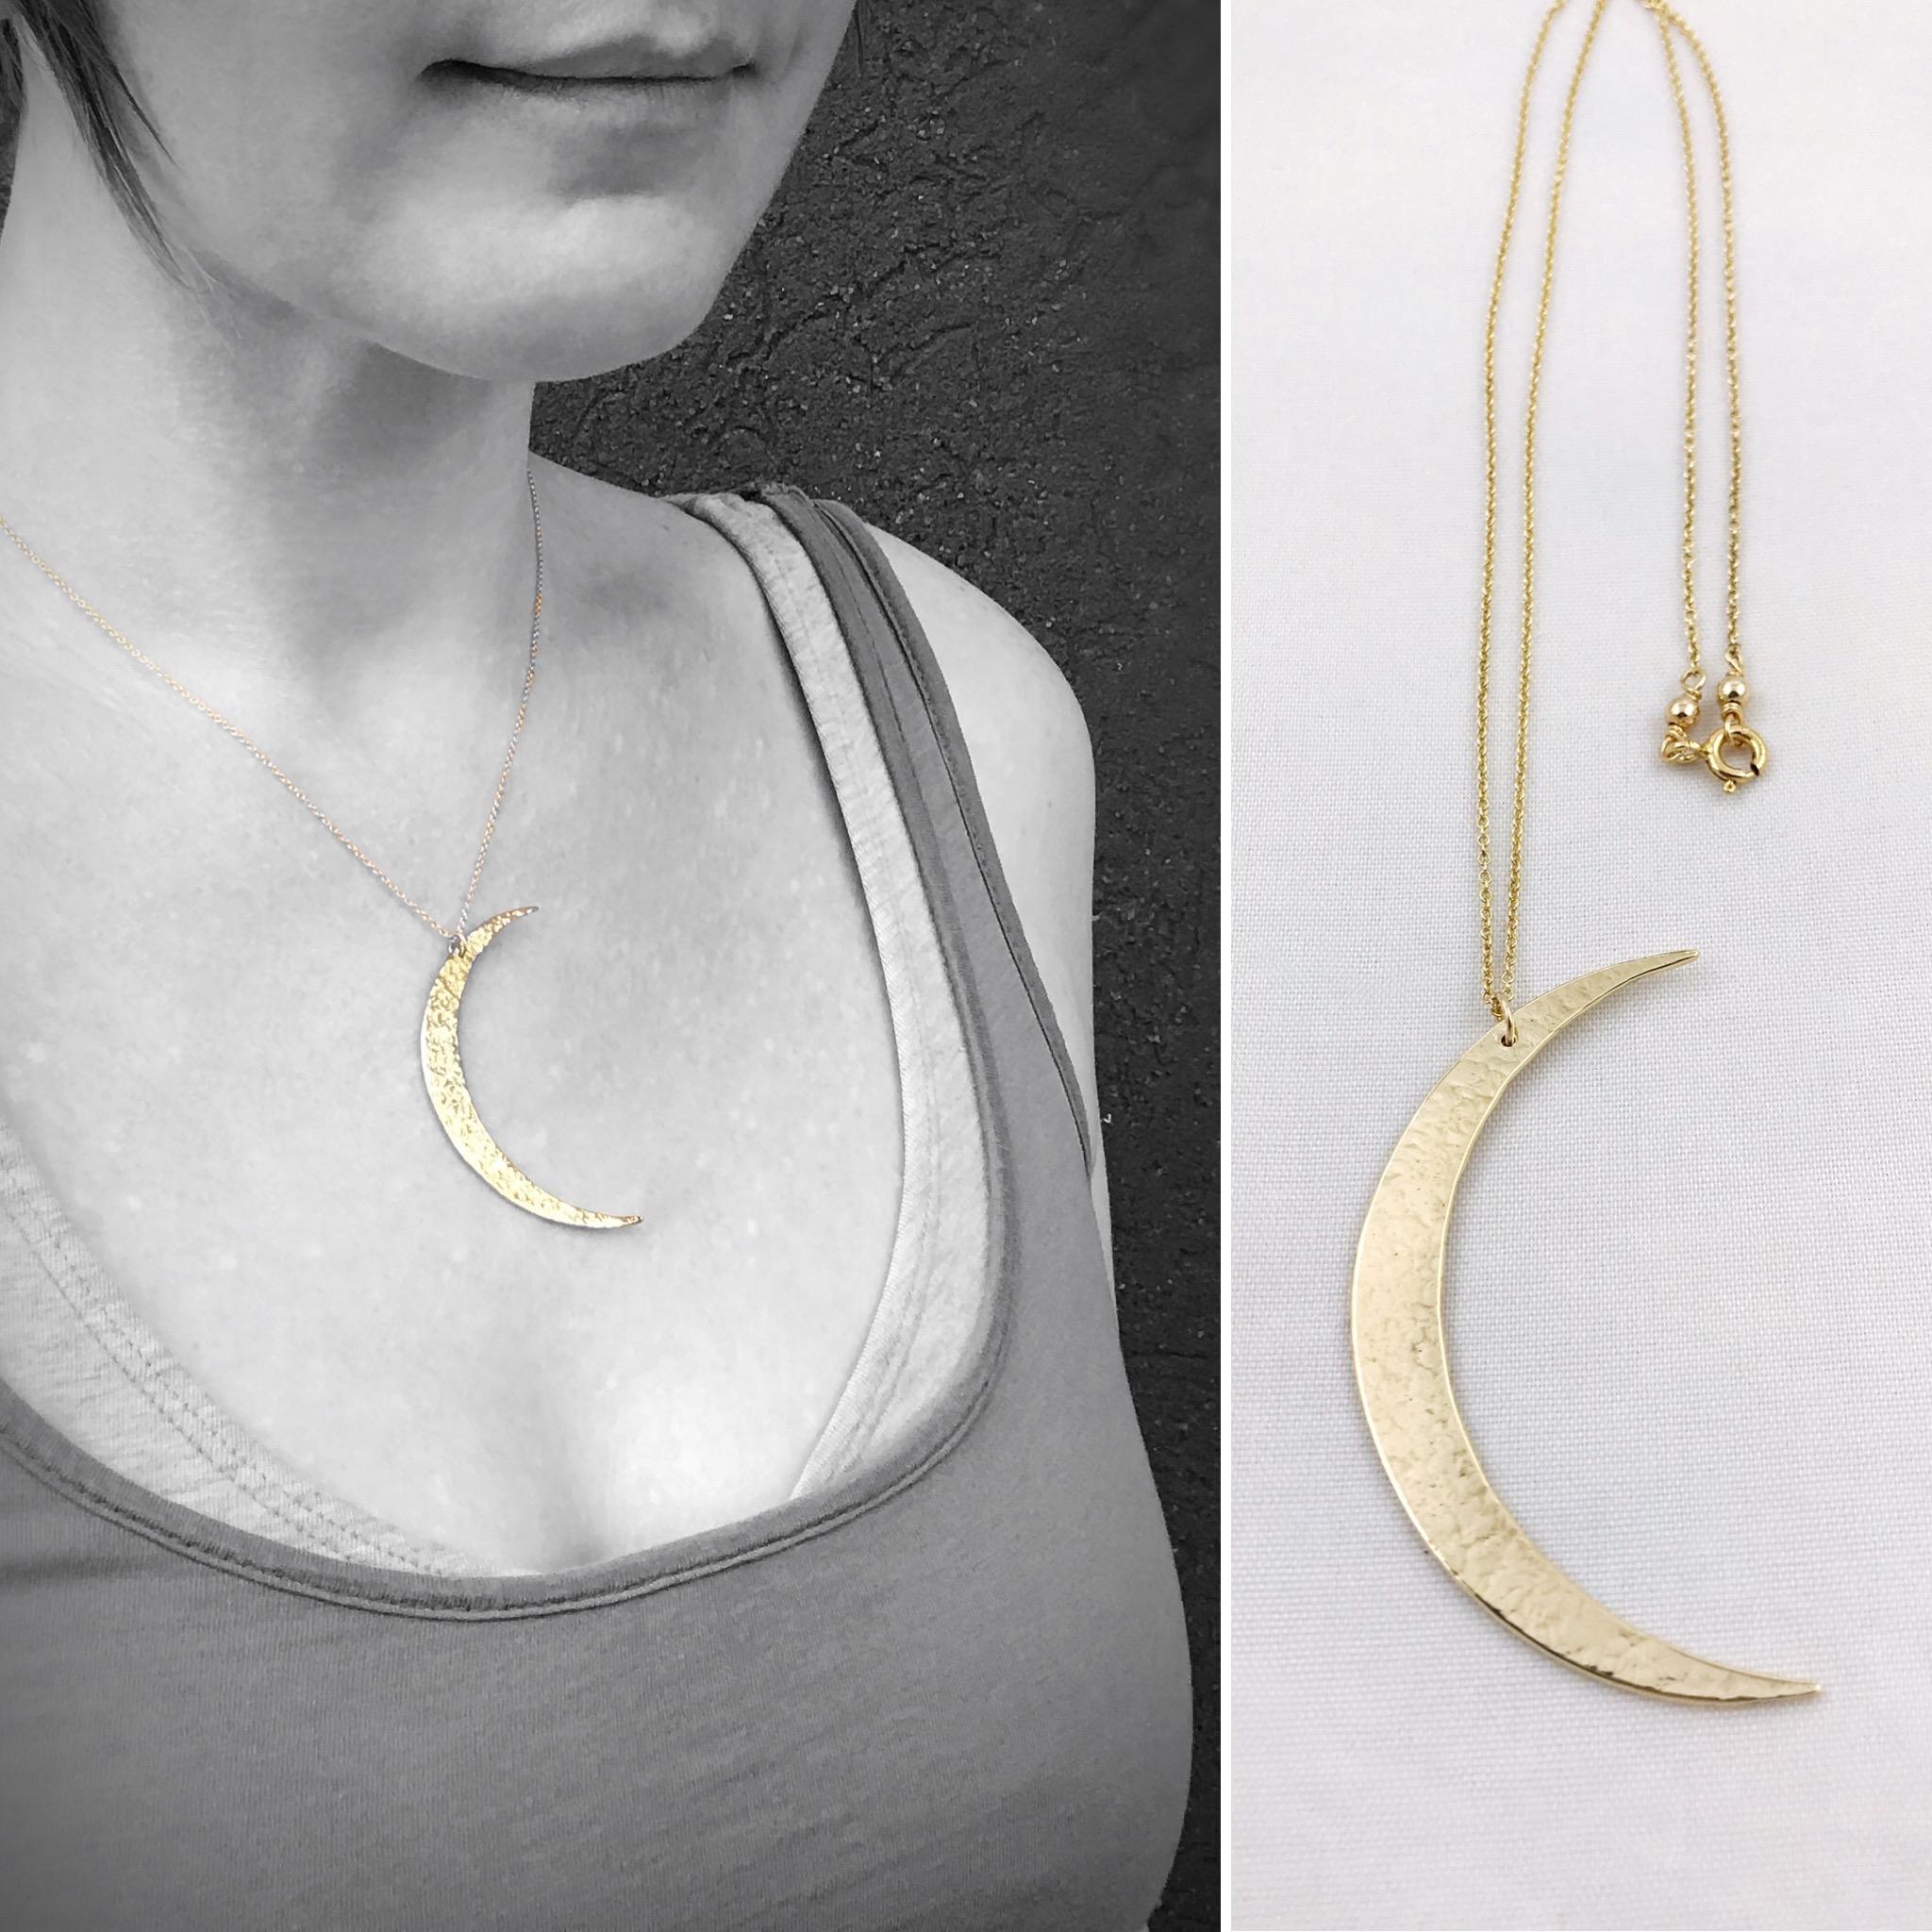 collier ooak necklace moon jewelry maxi necklace brass jewelry Crescent MOON NECKLACE BRASS necklace rigid neck jewelry design gold